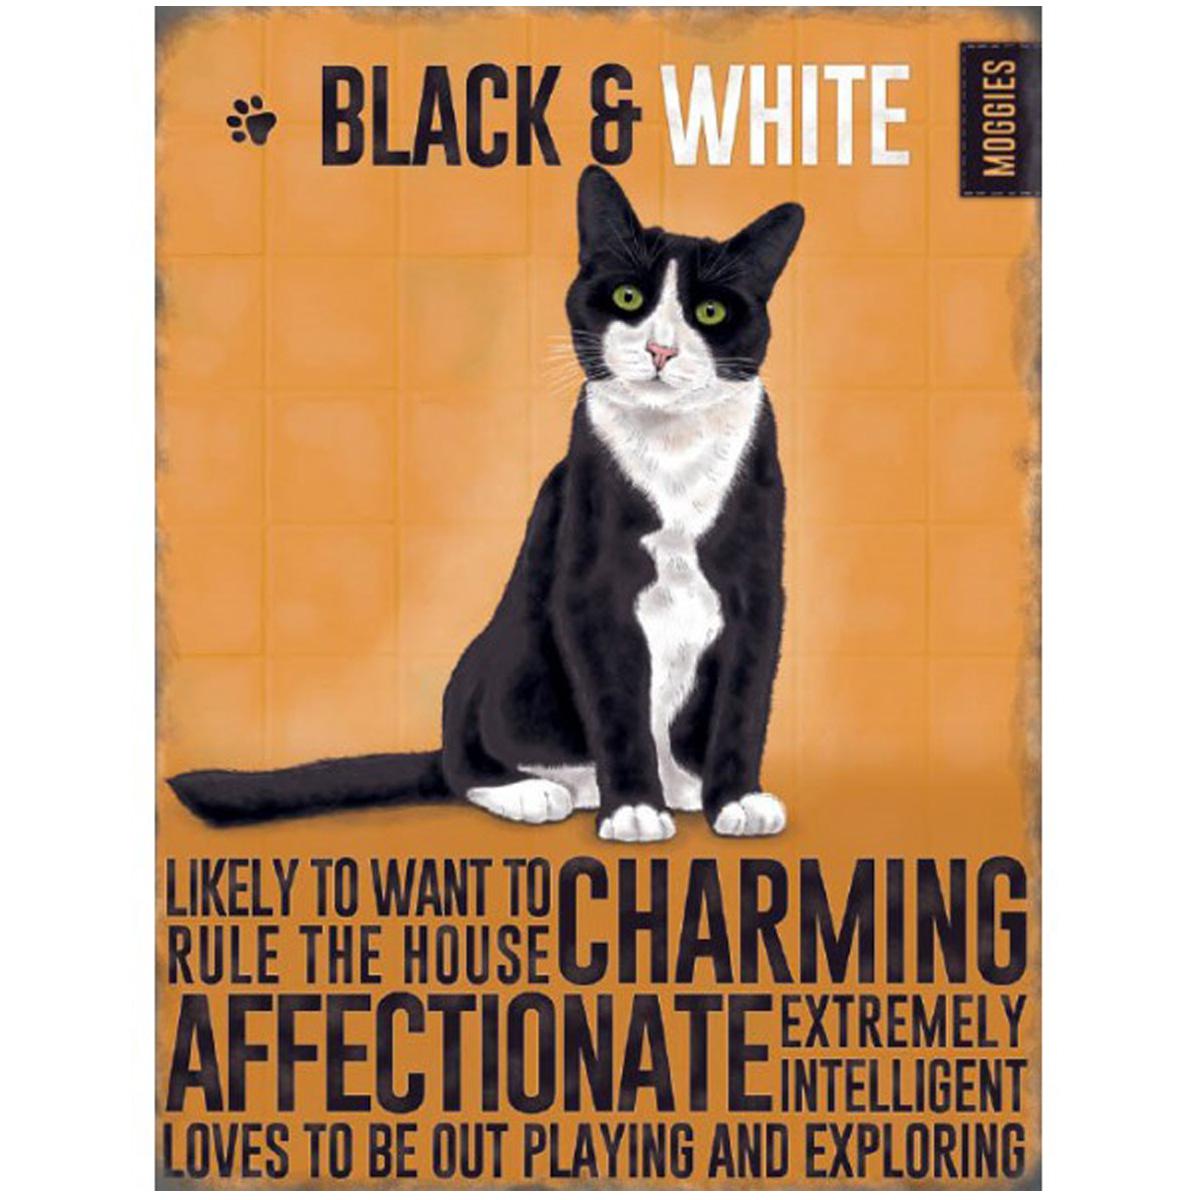 Magnet métal \'Chats\' orange noir blanc (Chat Noir & Blanc - Black and White) - 9x65 cm - [R1193]